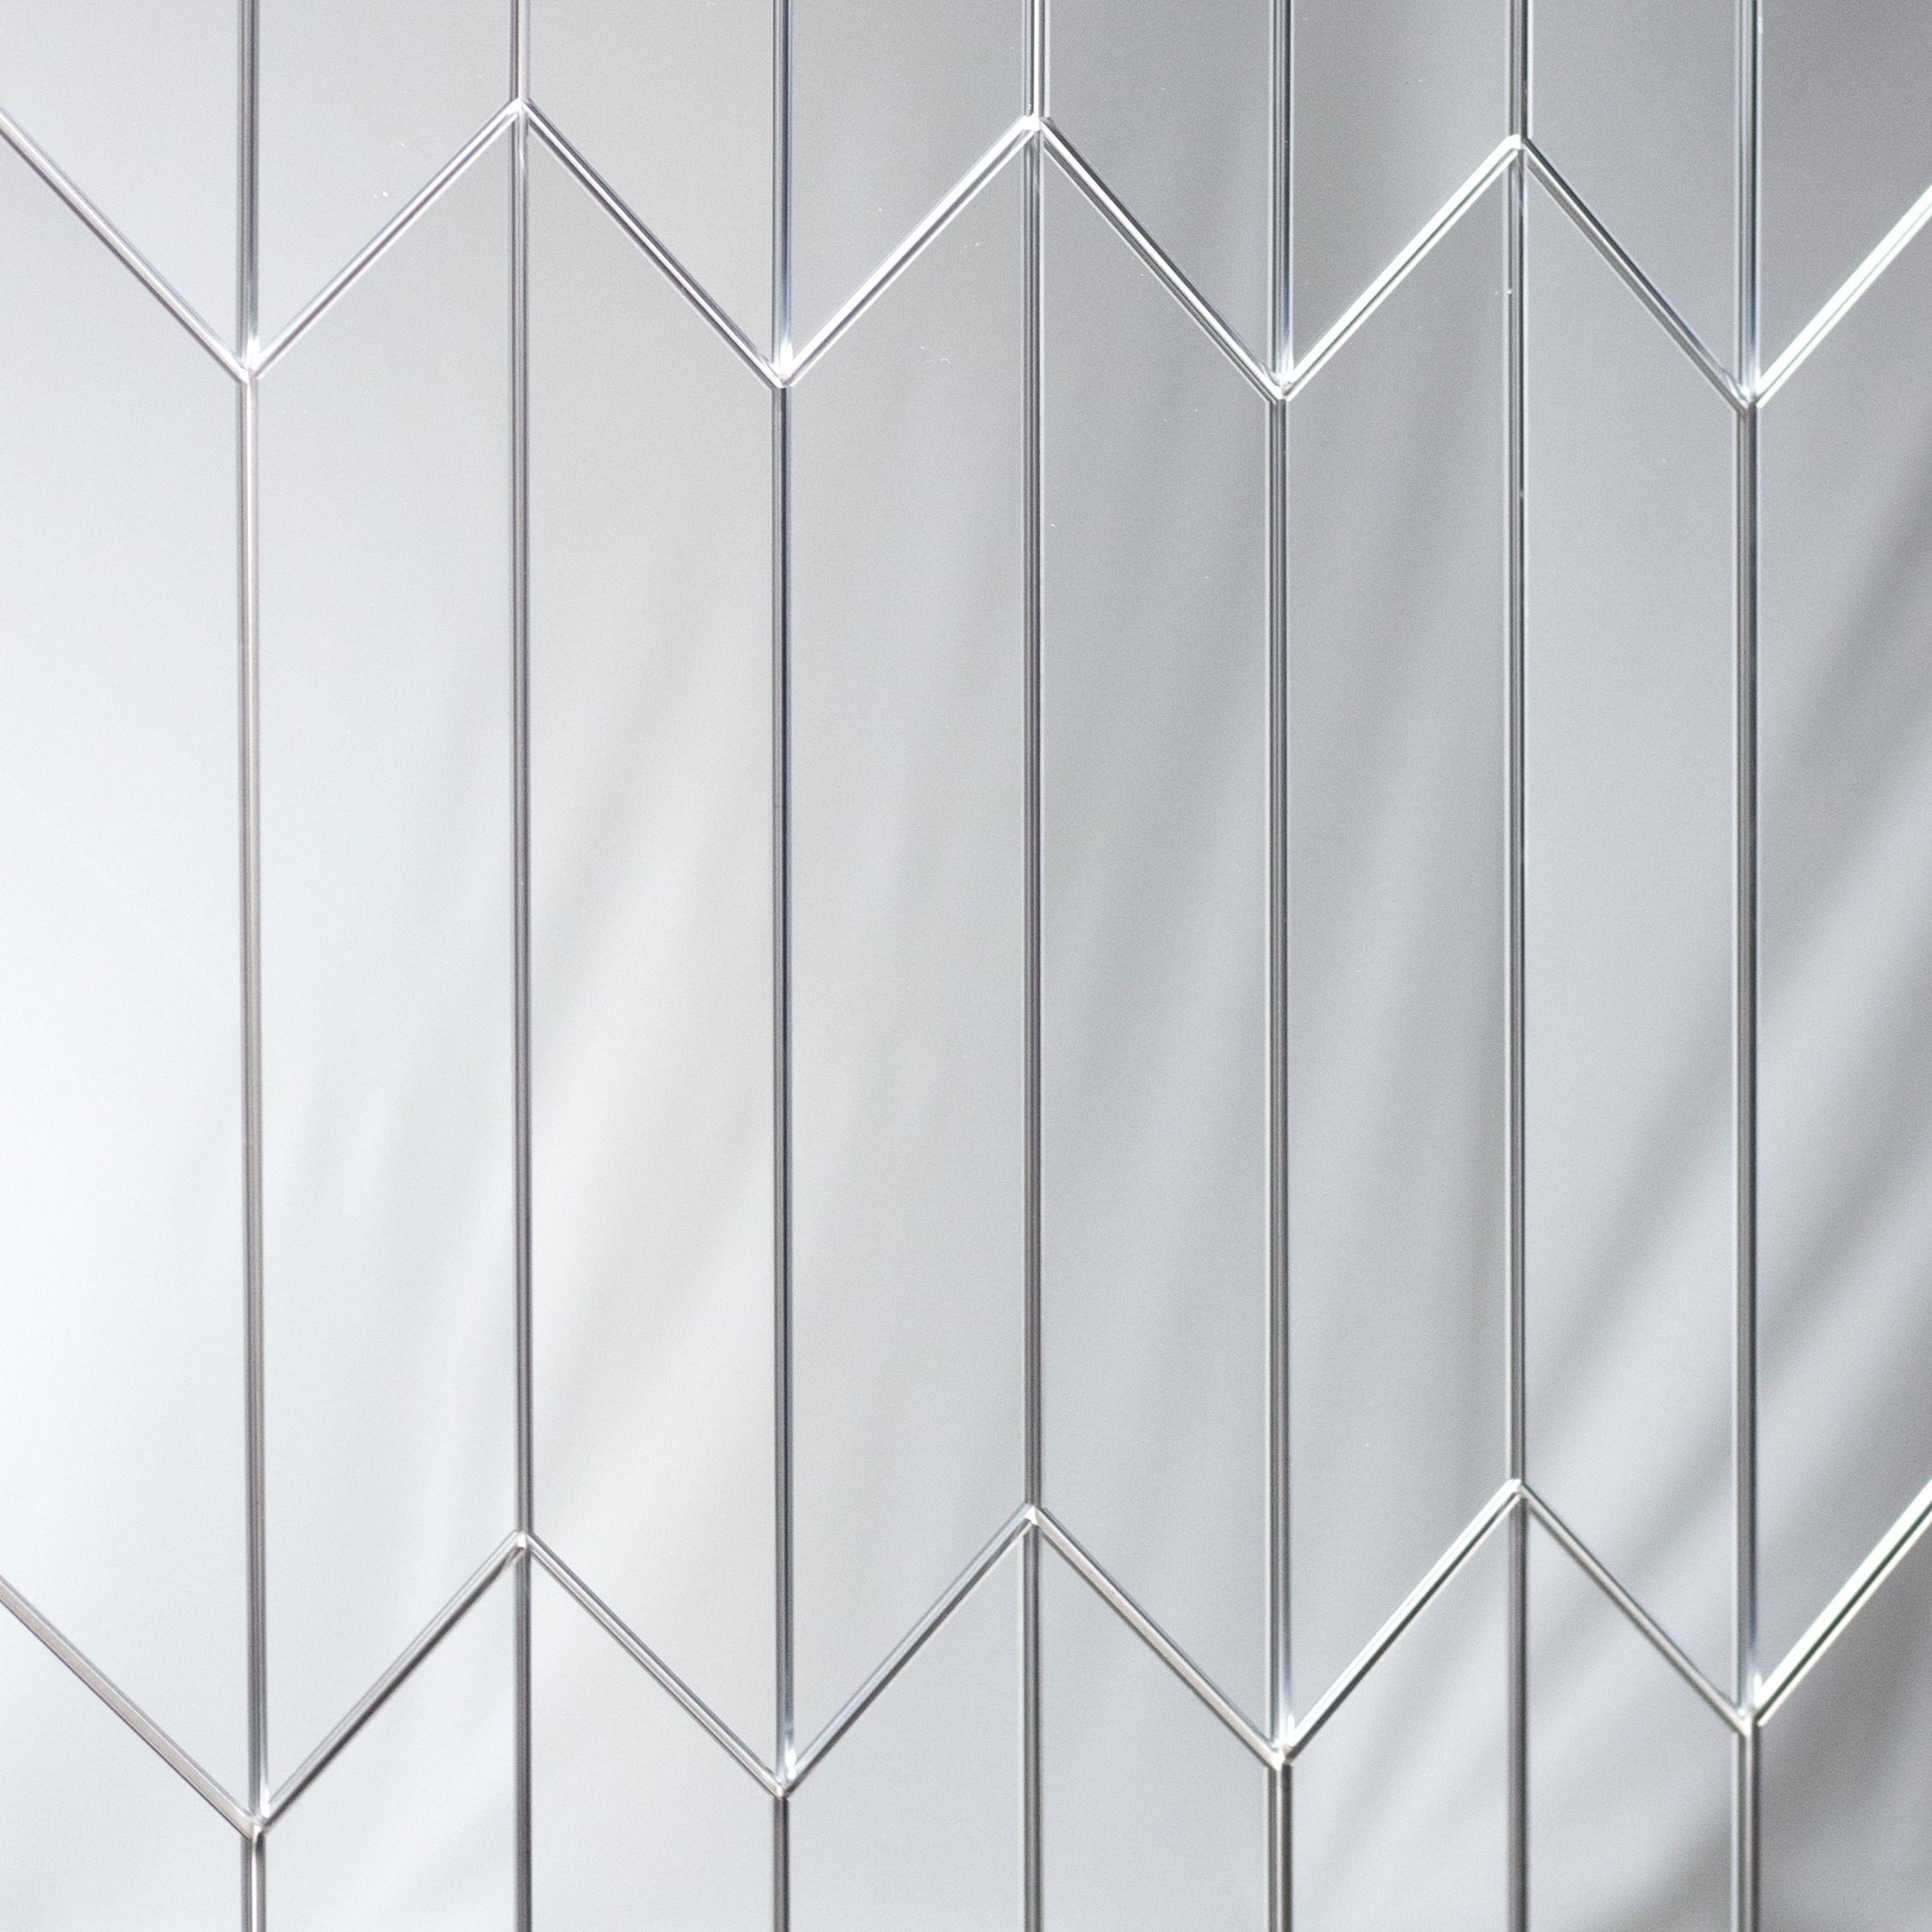 "Reflections 3.75"" x 11.75"" Straight Edge Silver Mirror Diamond Pair Backsplash Wall Tile"